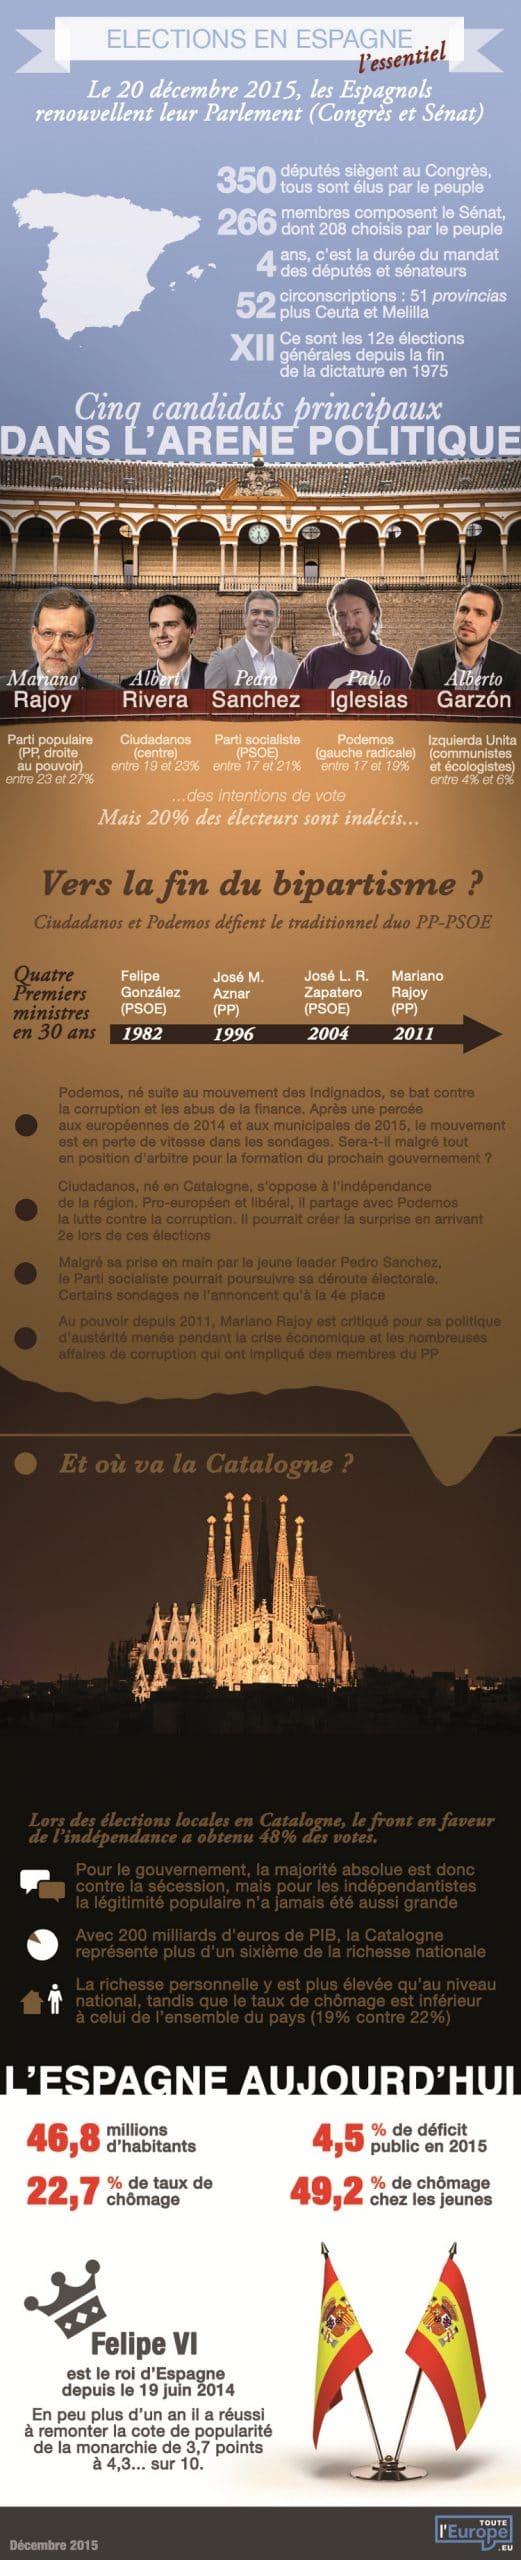 Législatives espagnoles - 2015